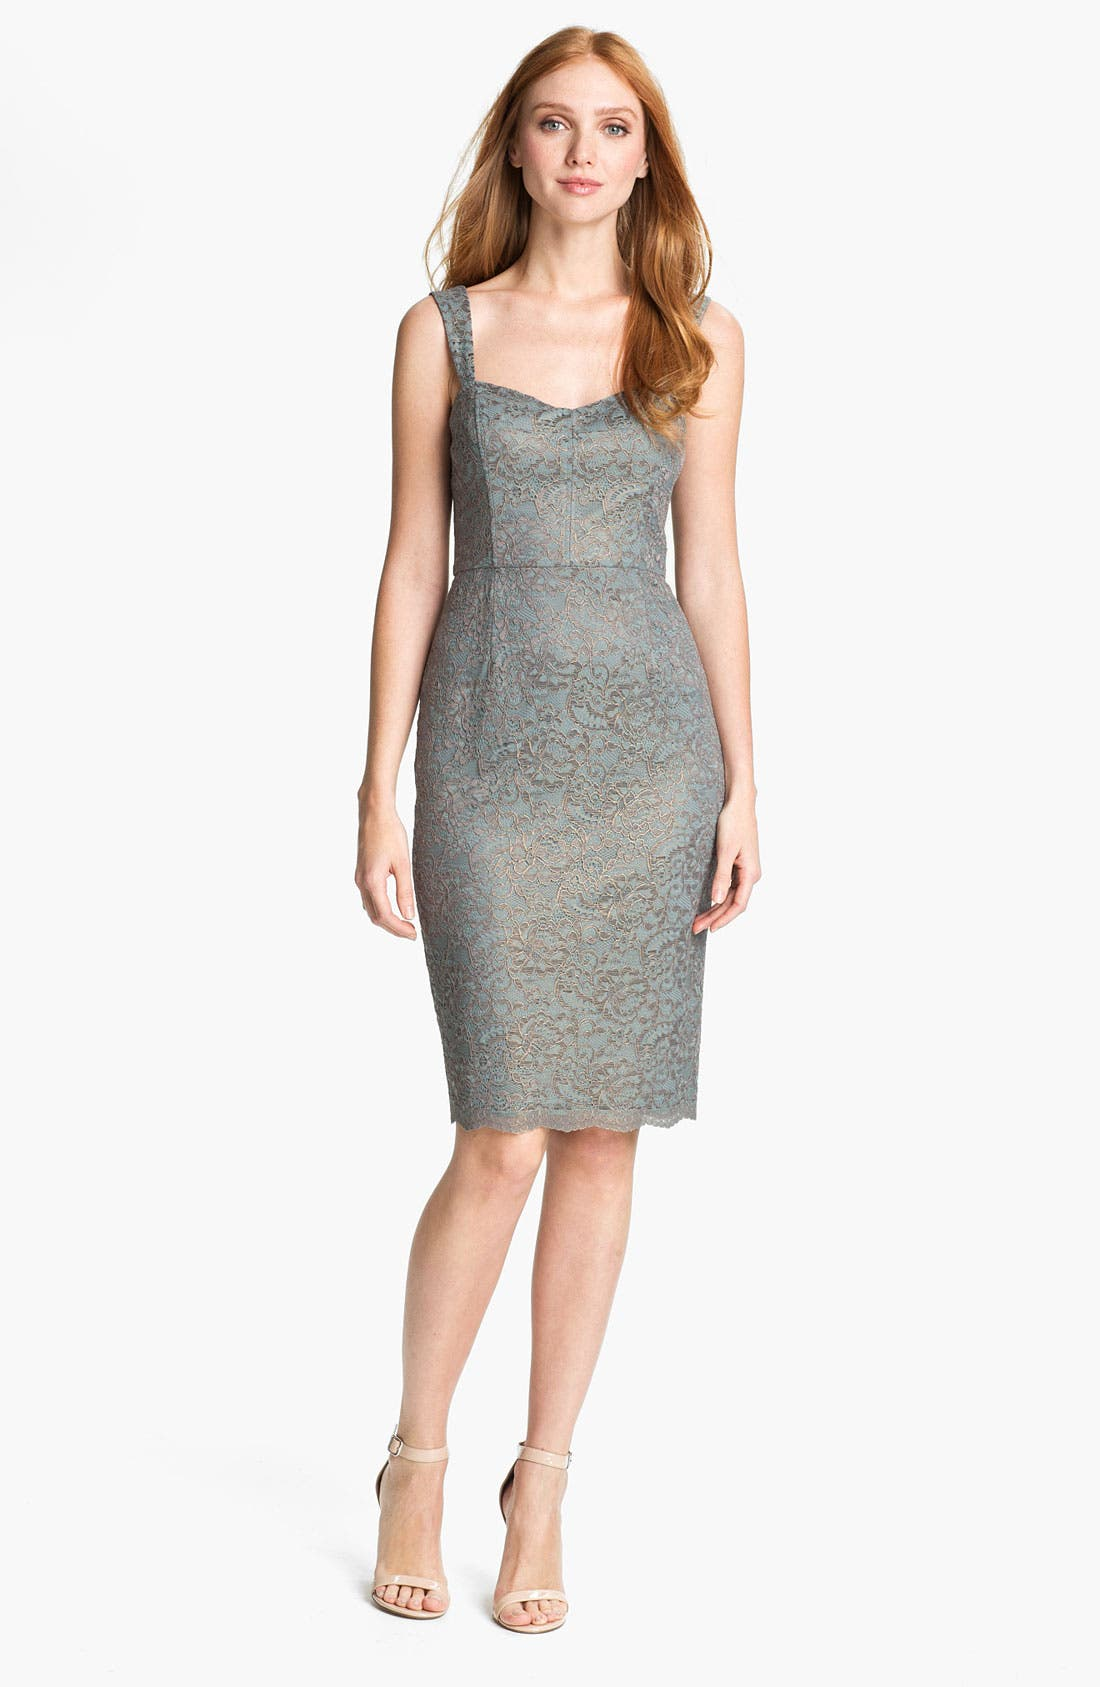 Alternate Image 1 Selected - Adrianna Papell Metallic Lace Sheath Dress